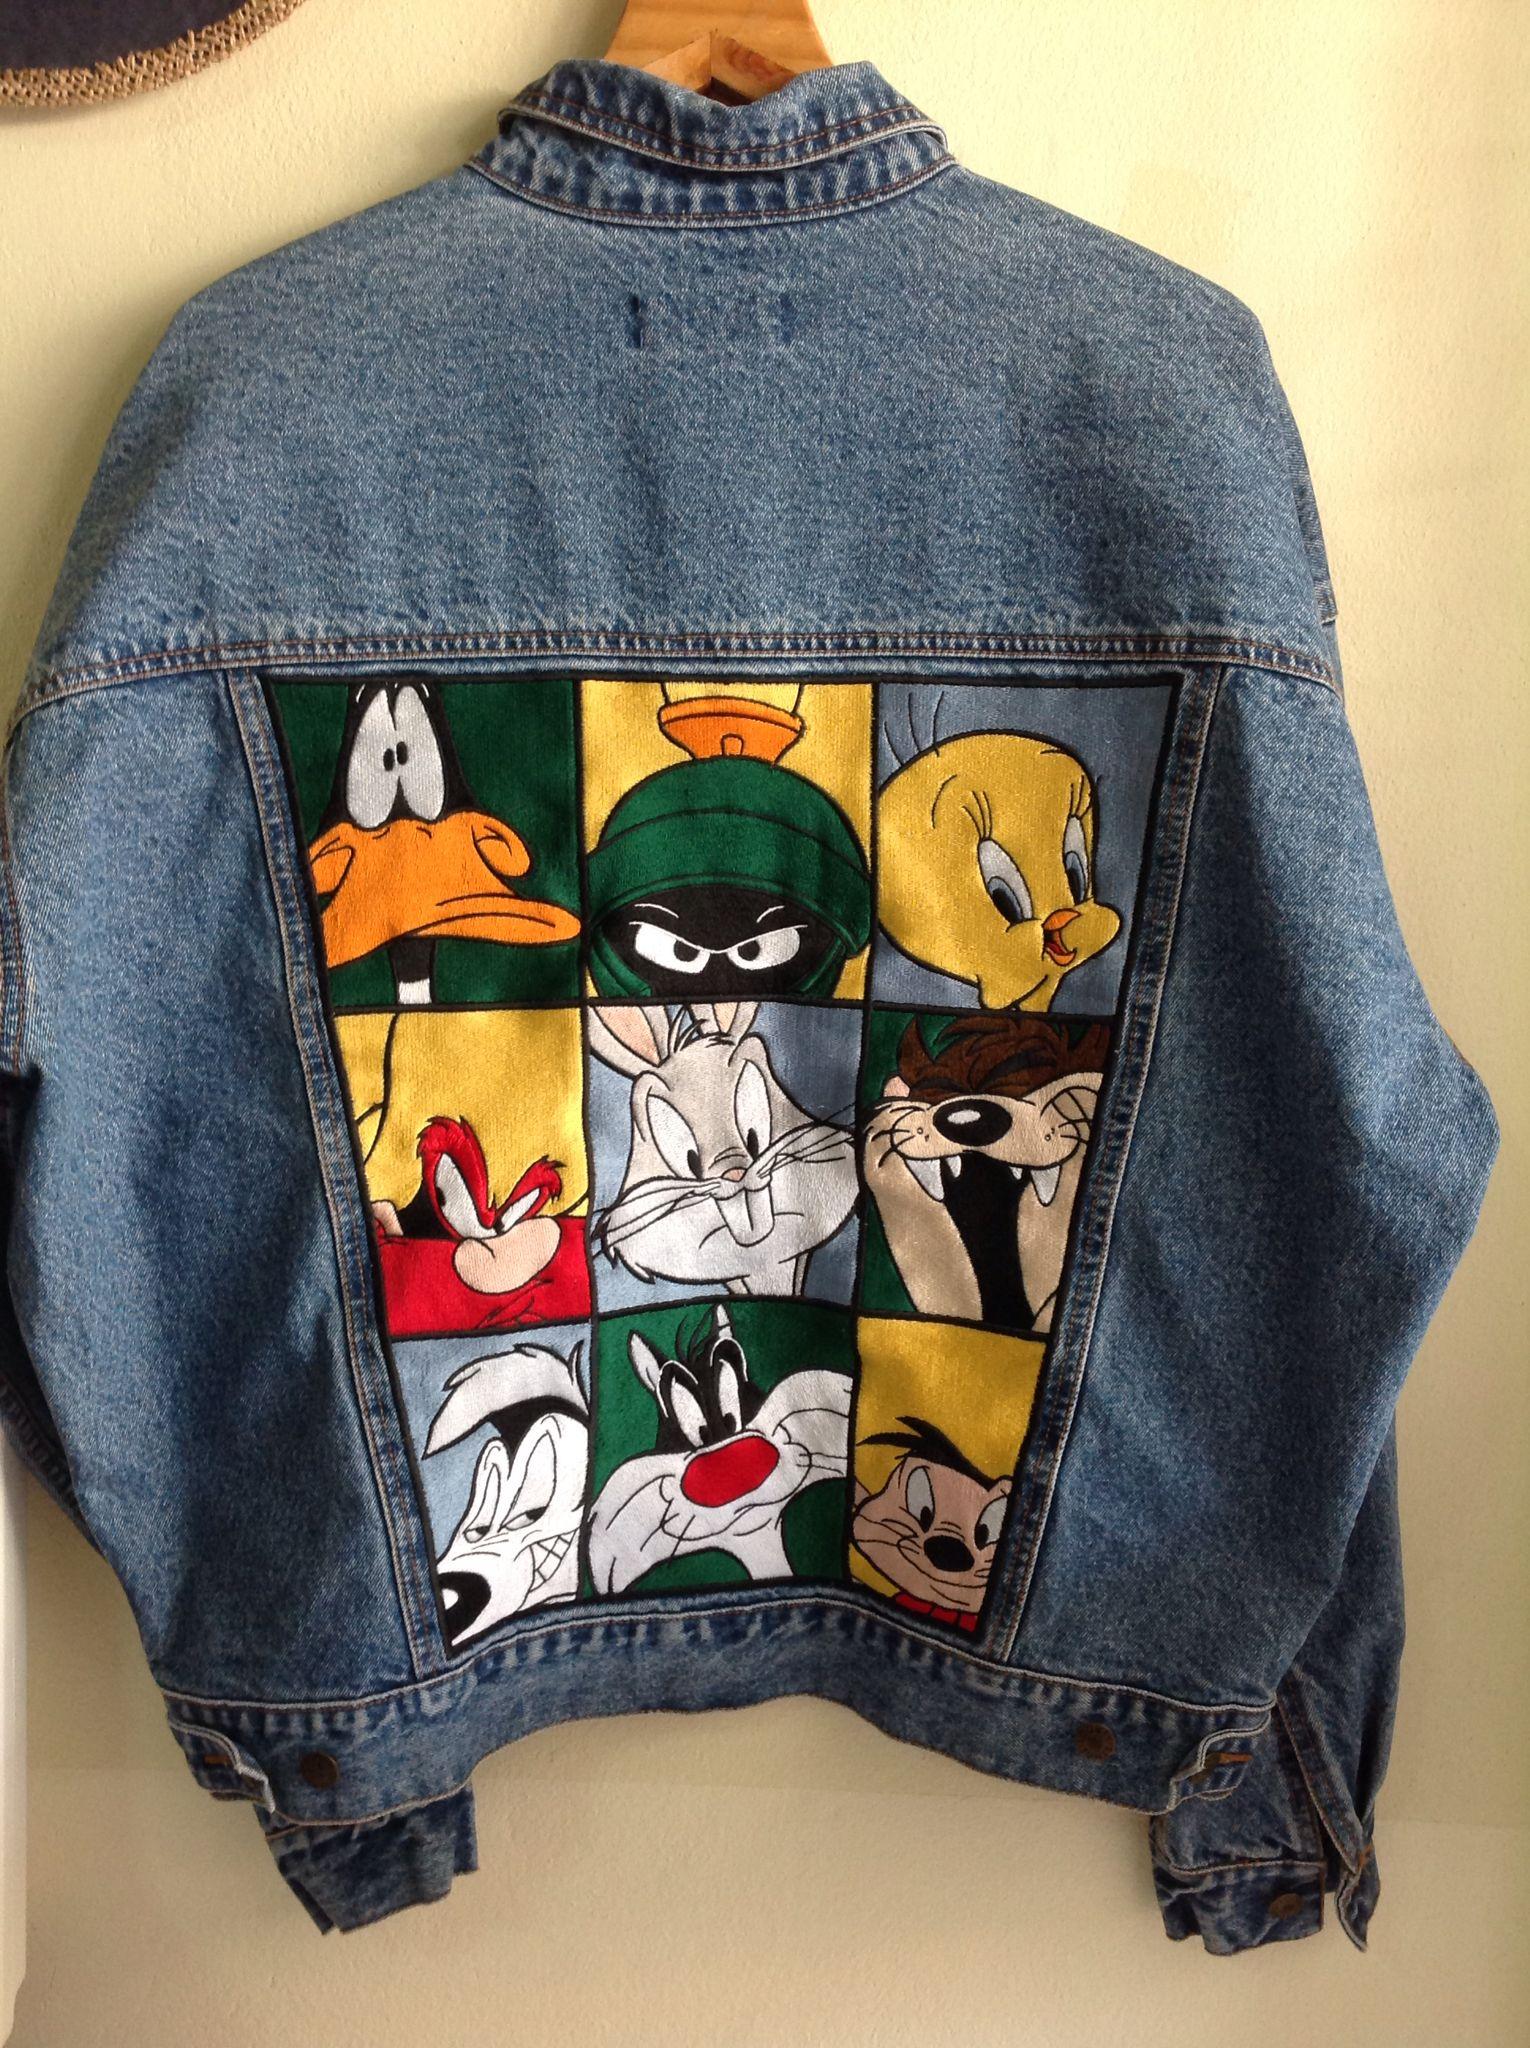 Disney Jacket 1200baht Art Clothes Painted Clothes Diy Denim Diy